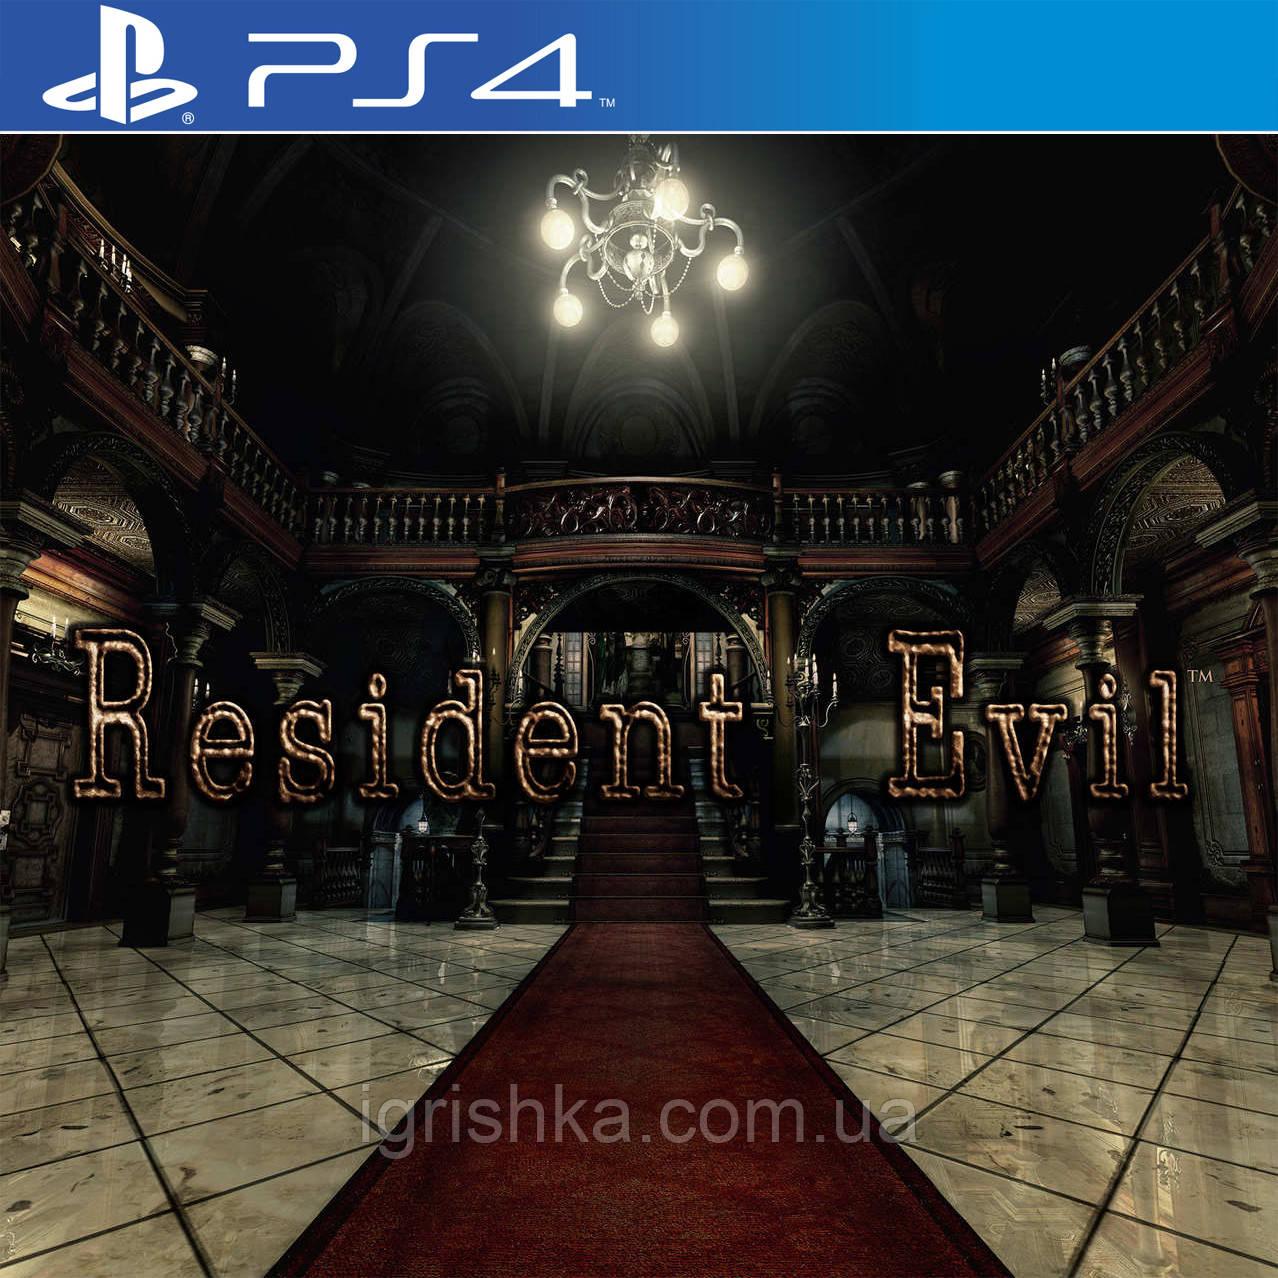 Resident Evil Ps4 (Цифровий аккаунт для PlayStation 4) П3